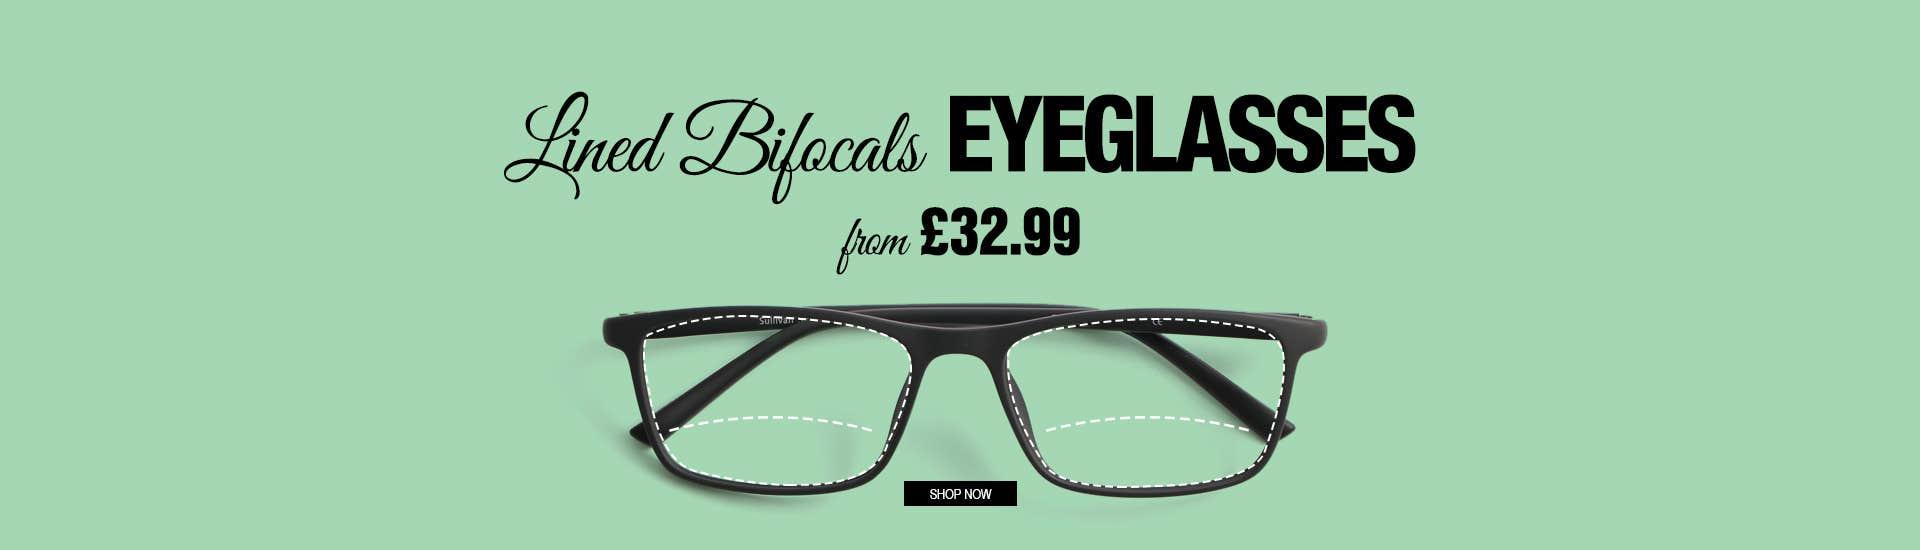 f12c7e657e0 bifocal eyeglasses online